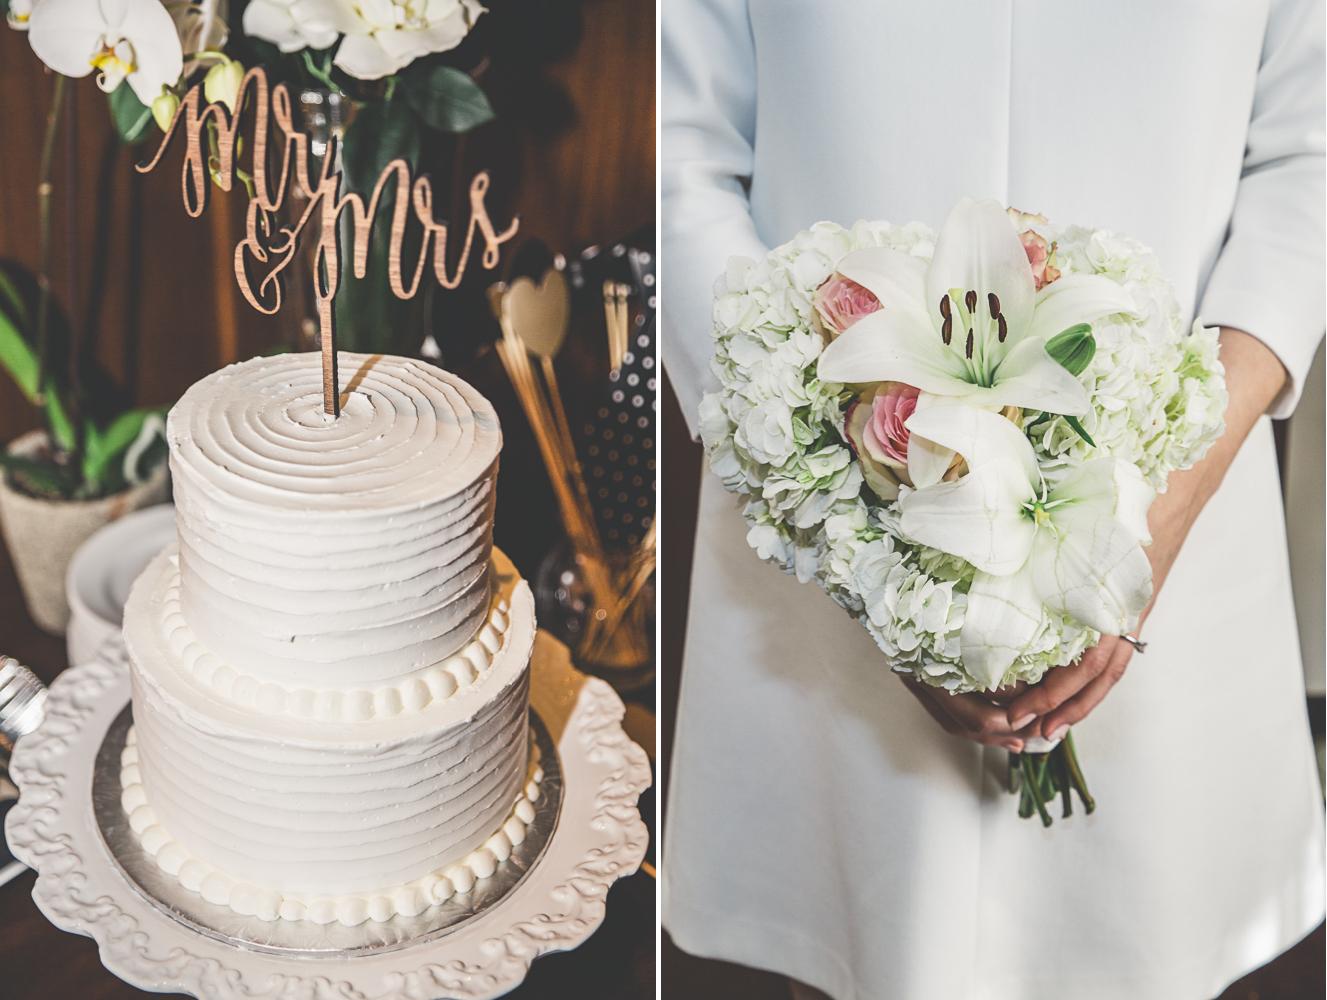 cake-bouquet.jpg